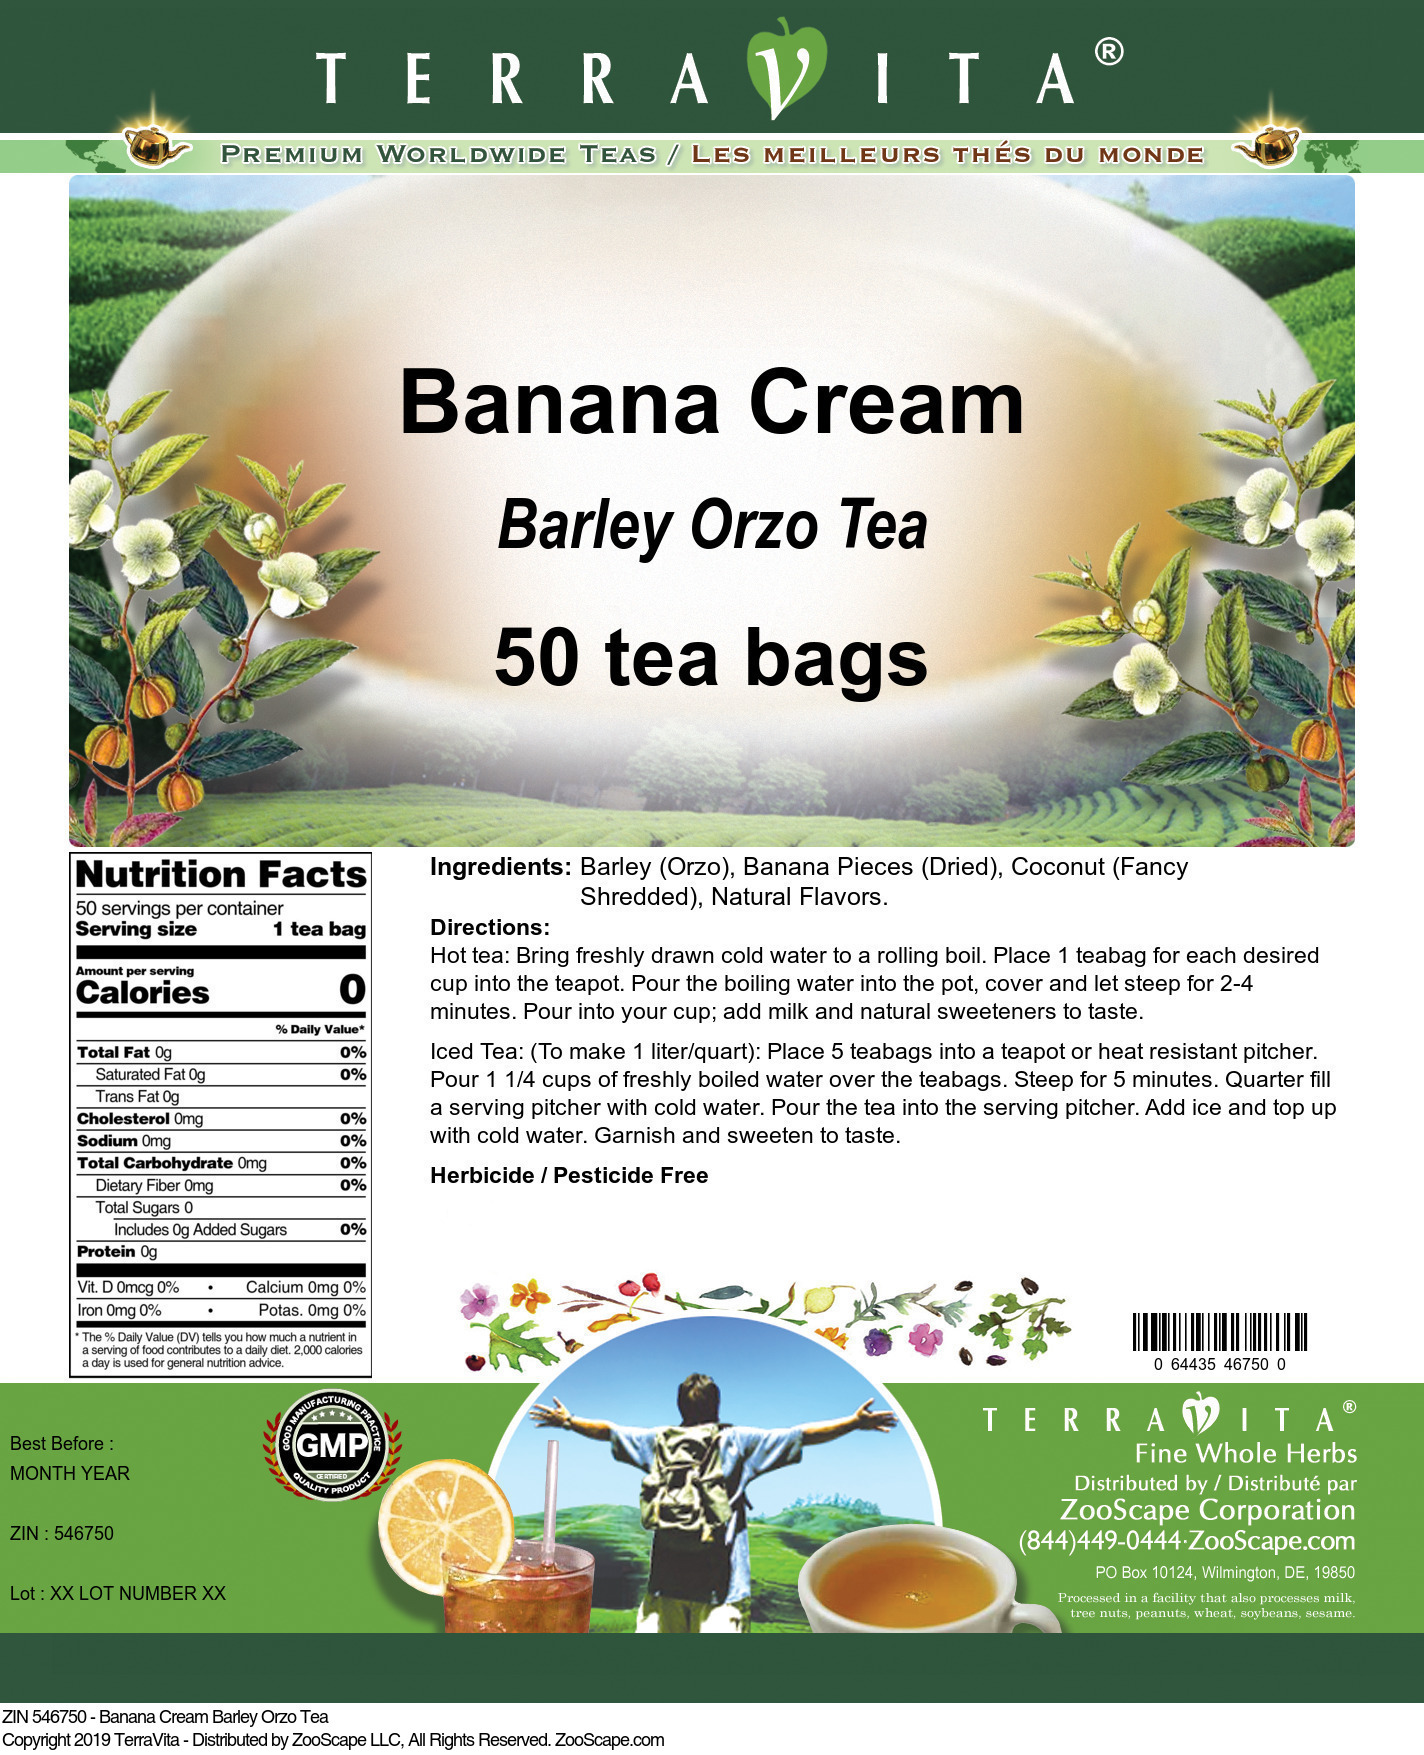 Banana Cream Barley Orzo